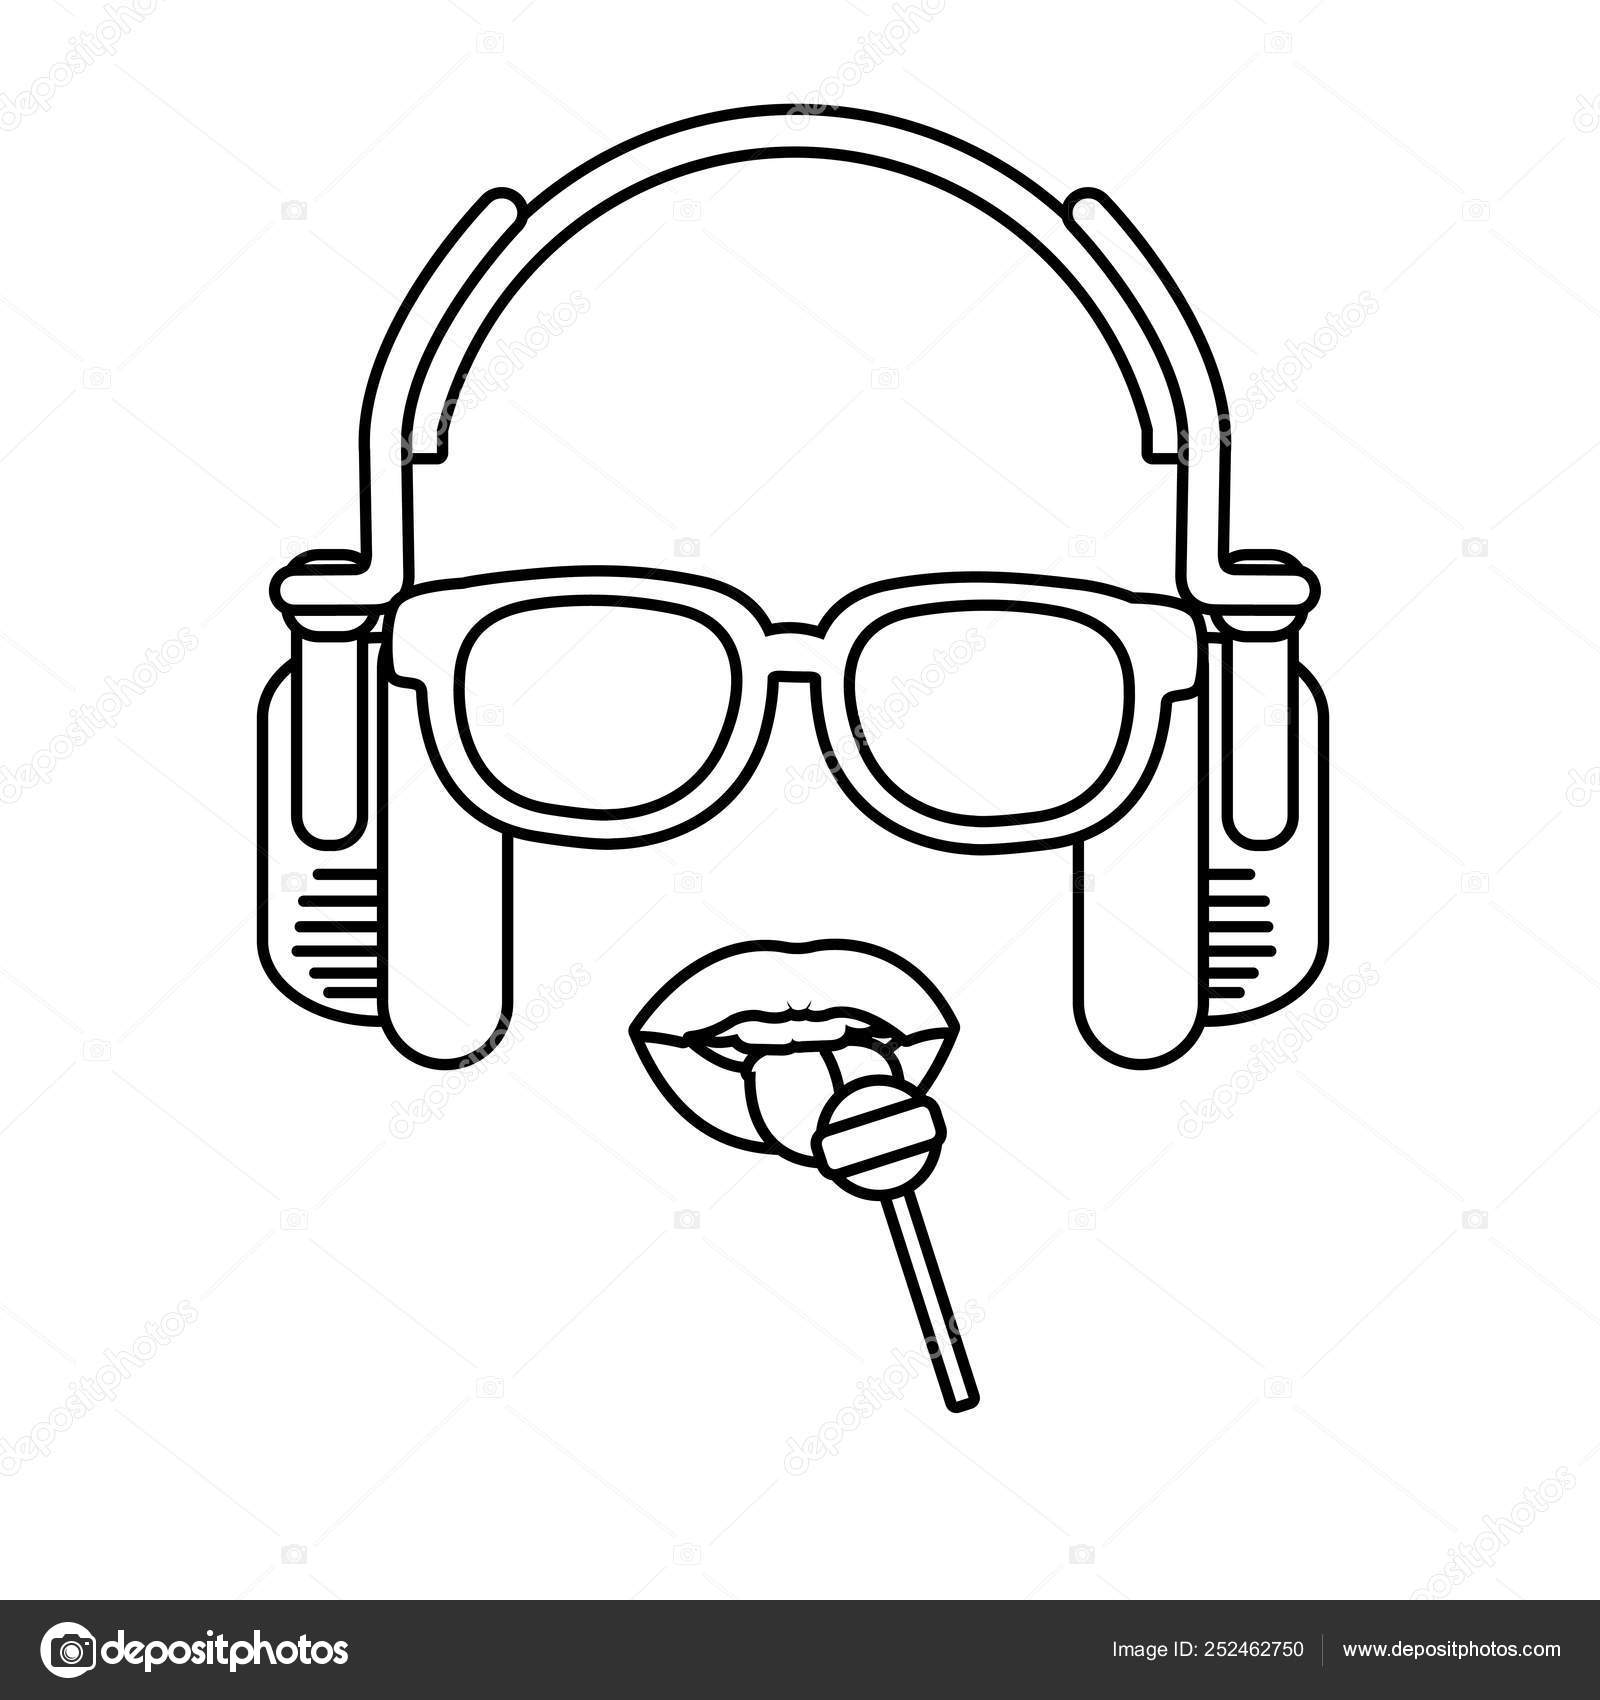 Retro Sexy Pop Art Lips Earpod Wearing Sunglasses Cartoon Vector Stock Vector C Stockgiu 252462750